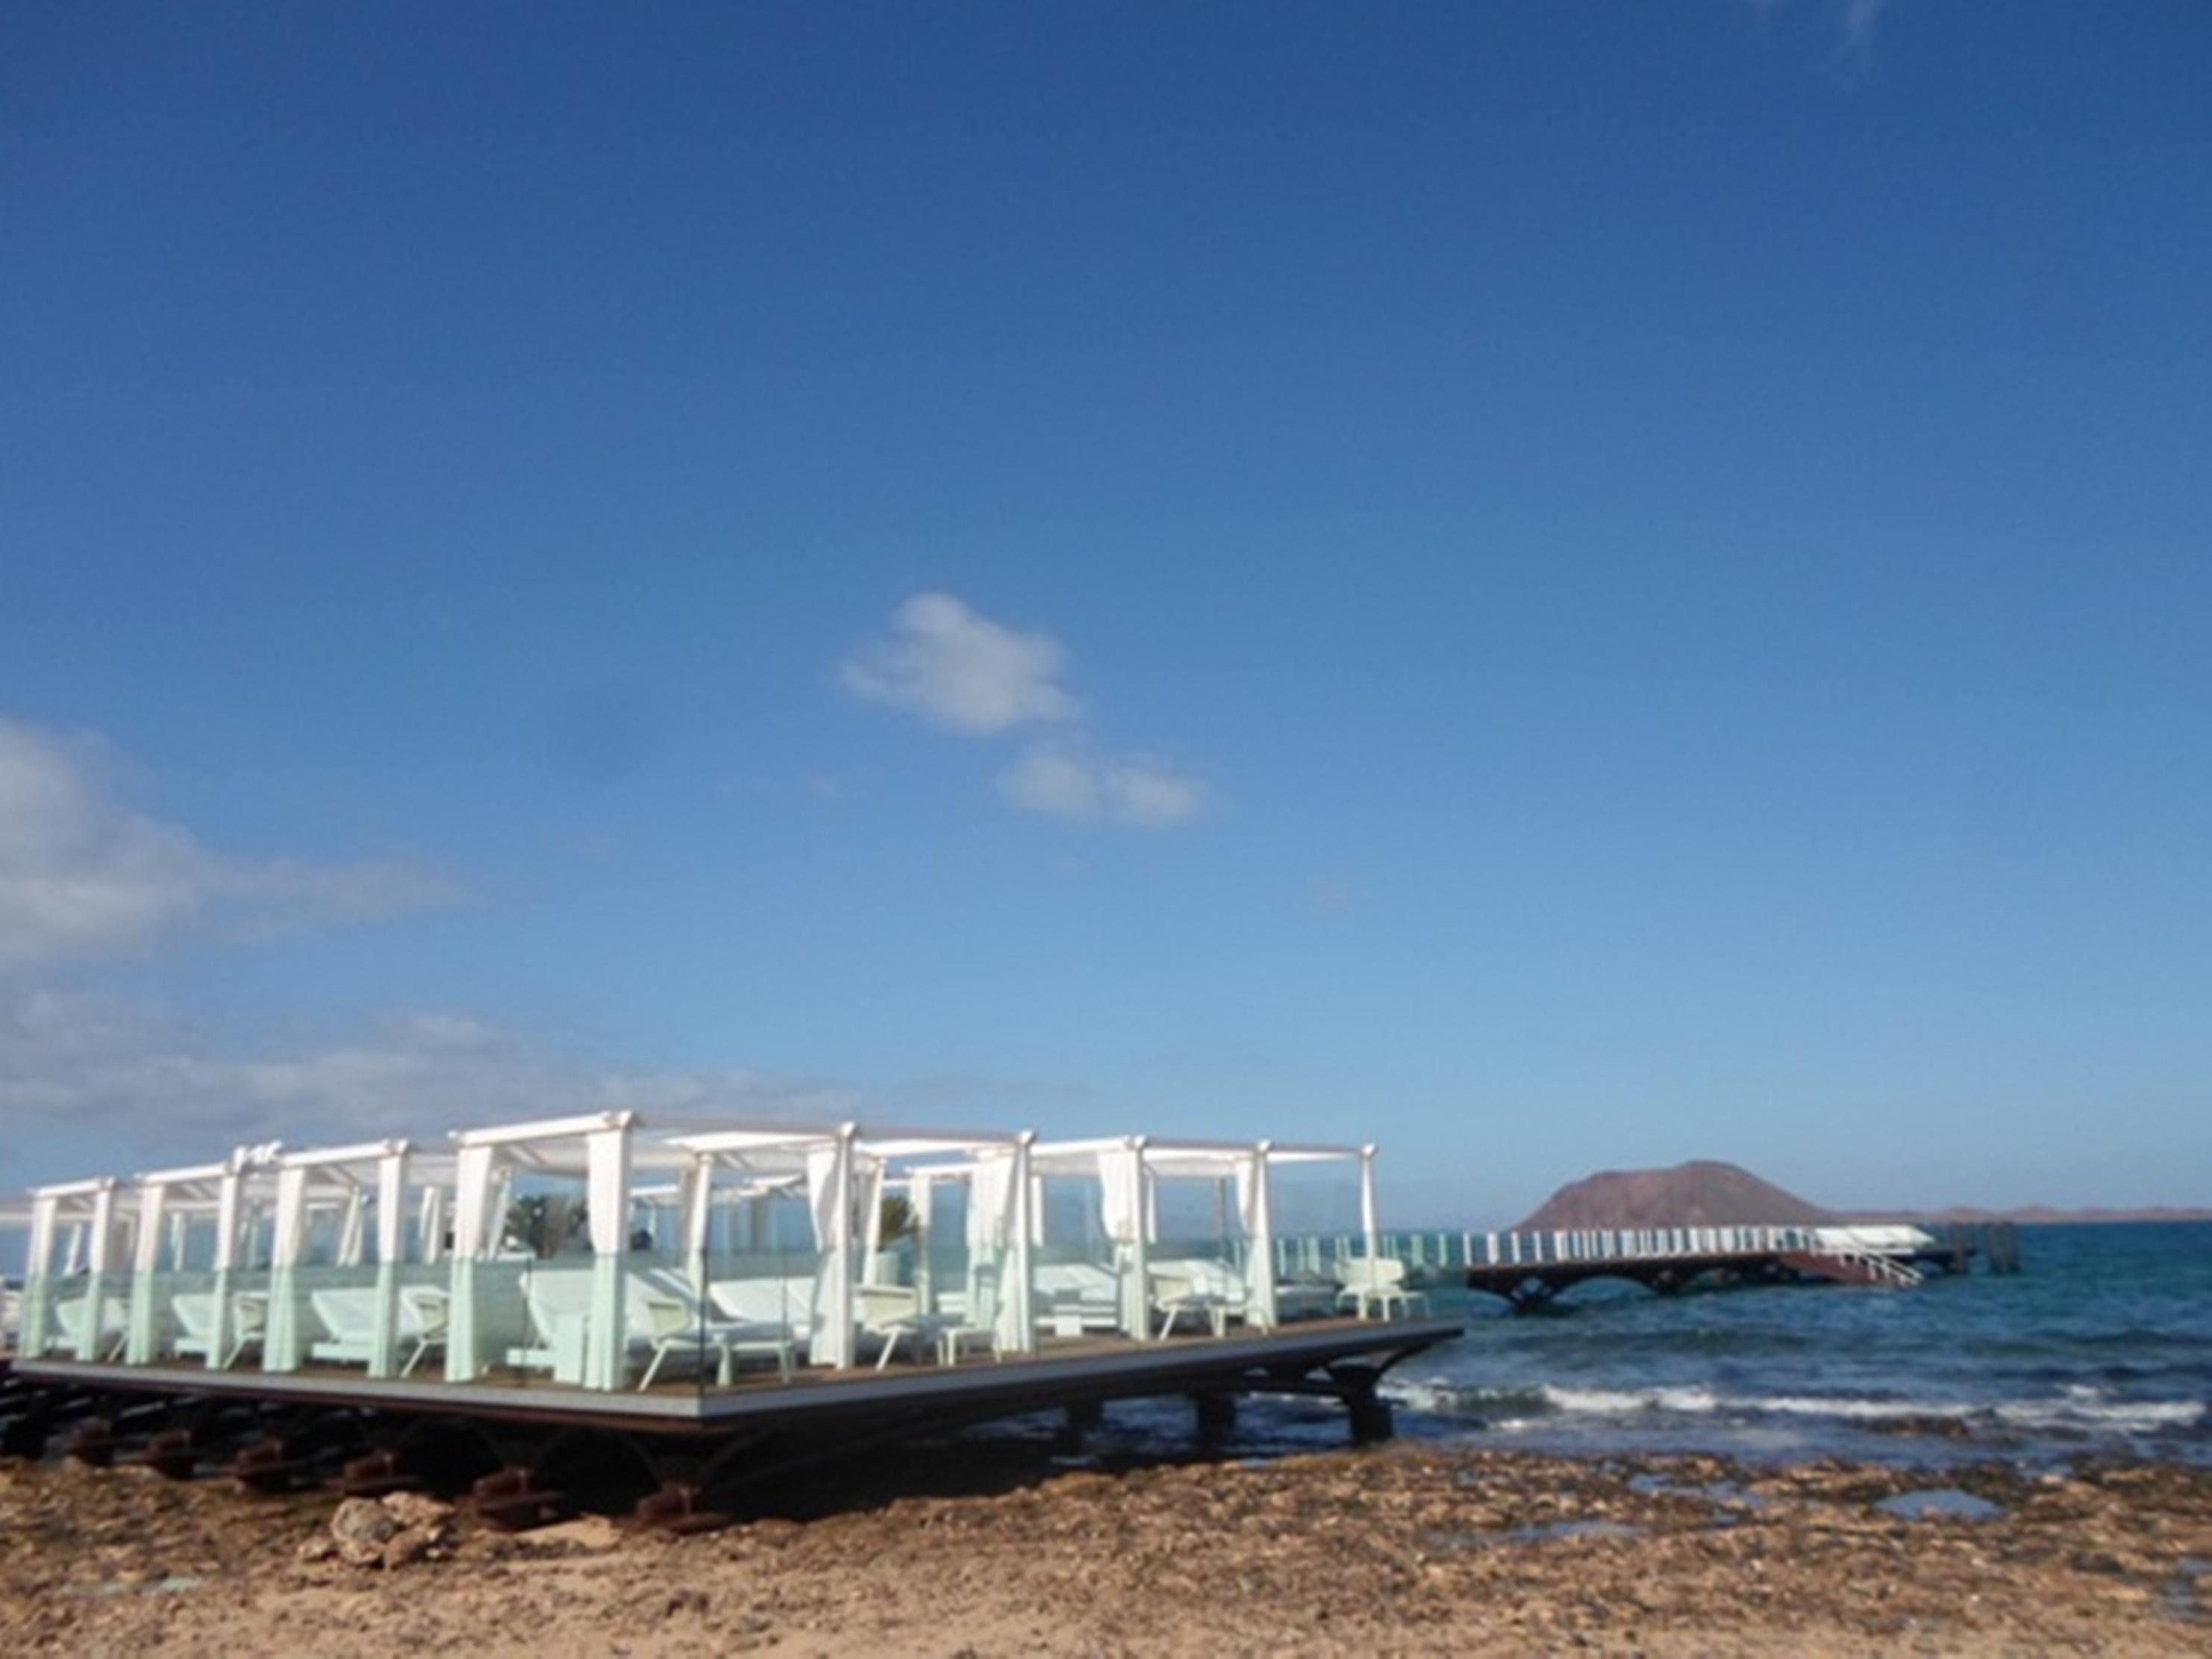 Ferienwohnung Wohnung El Mirador -Residencial Las Dunas - (2196686), Corralejo, Fuerteventura, Kanarische Inseln, Spanien, Bild 18